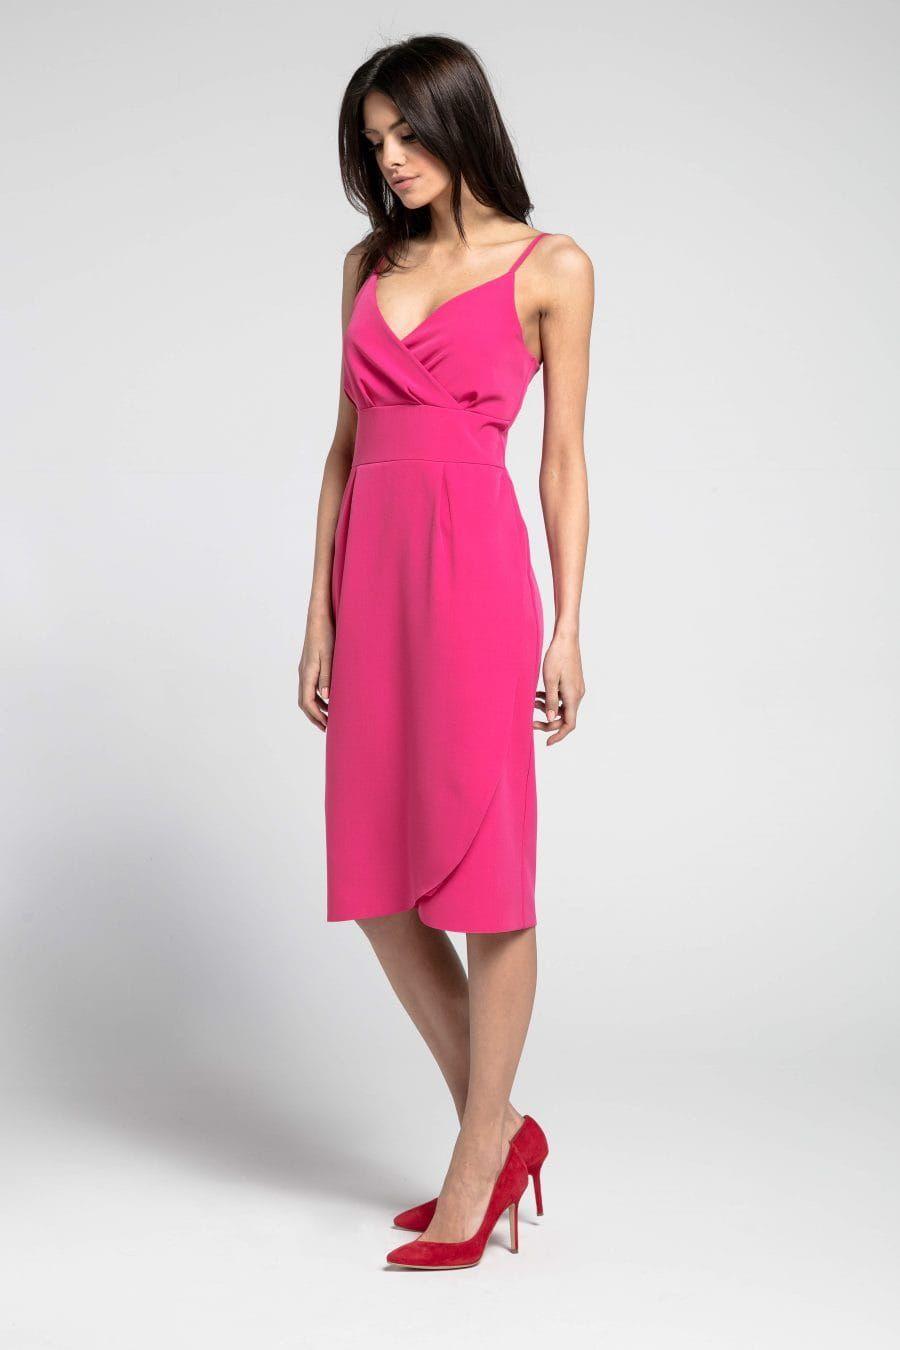 Dopasowana Sukienka Na Ramiaczkach Fuksja Na1033 Fitted Midi Dress Midi Dress Dresses